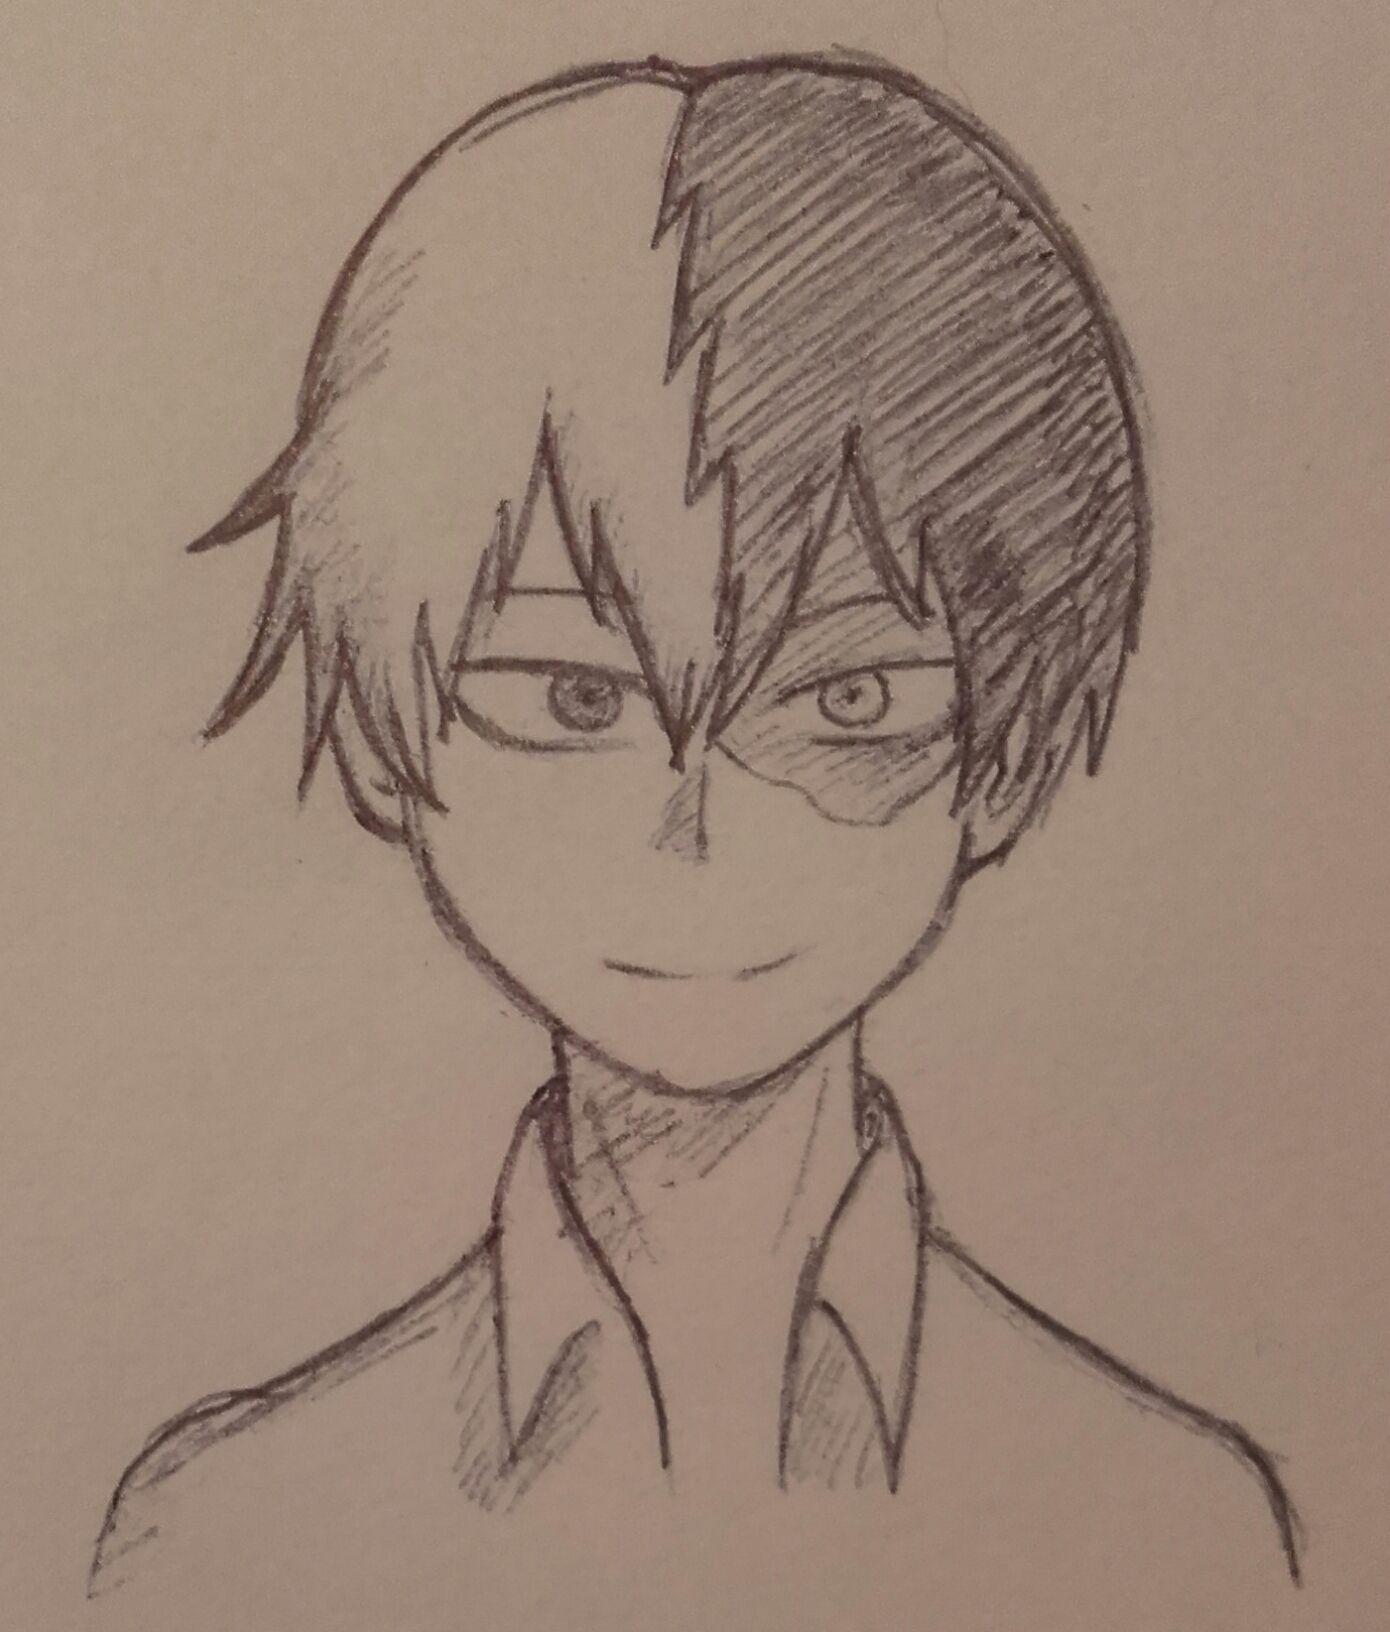 My Hero Academia Drawing Easy Pencil Drawingsketch101 Com In 2020 Easy Drawings Drawings My Hero